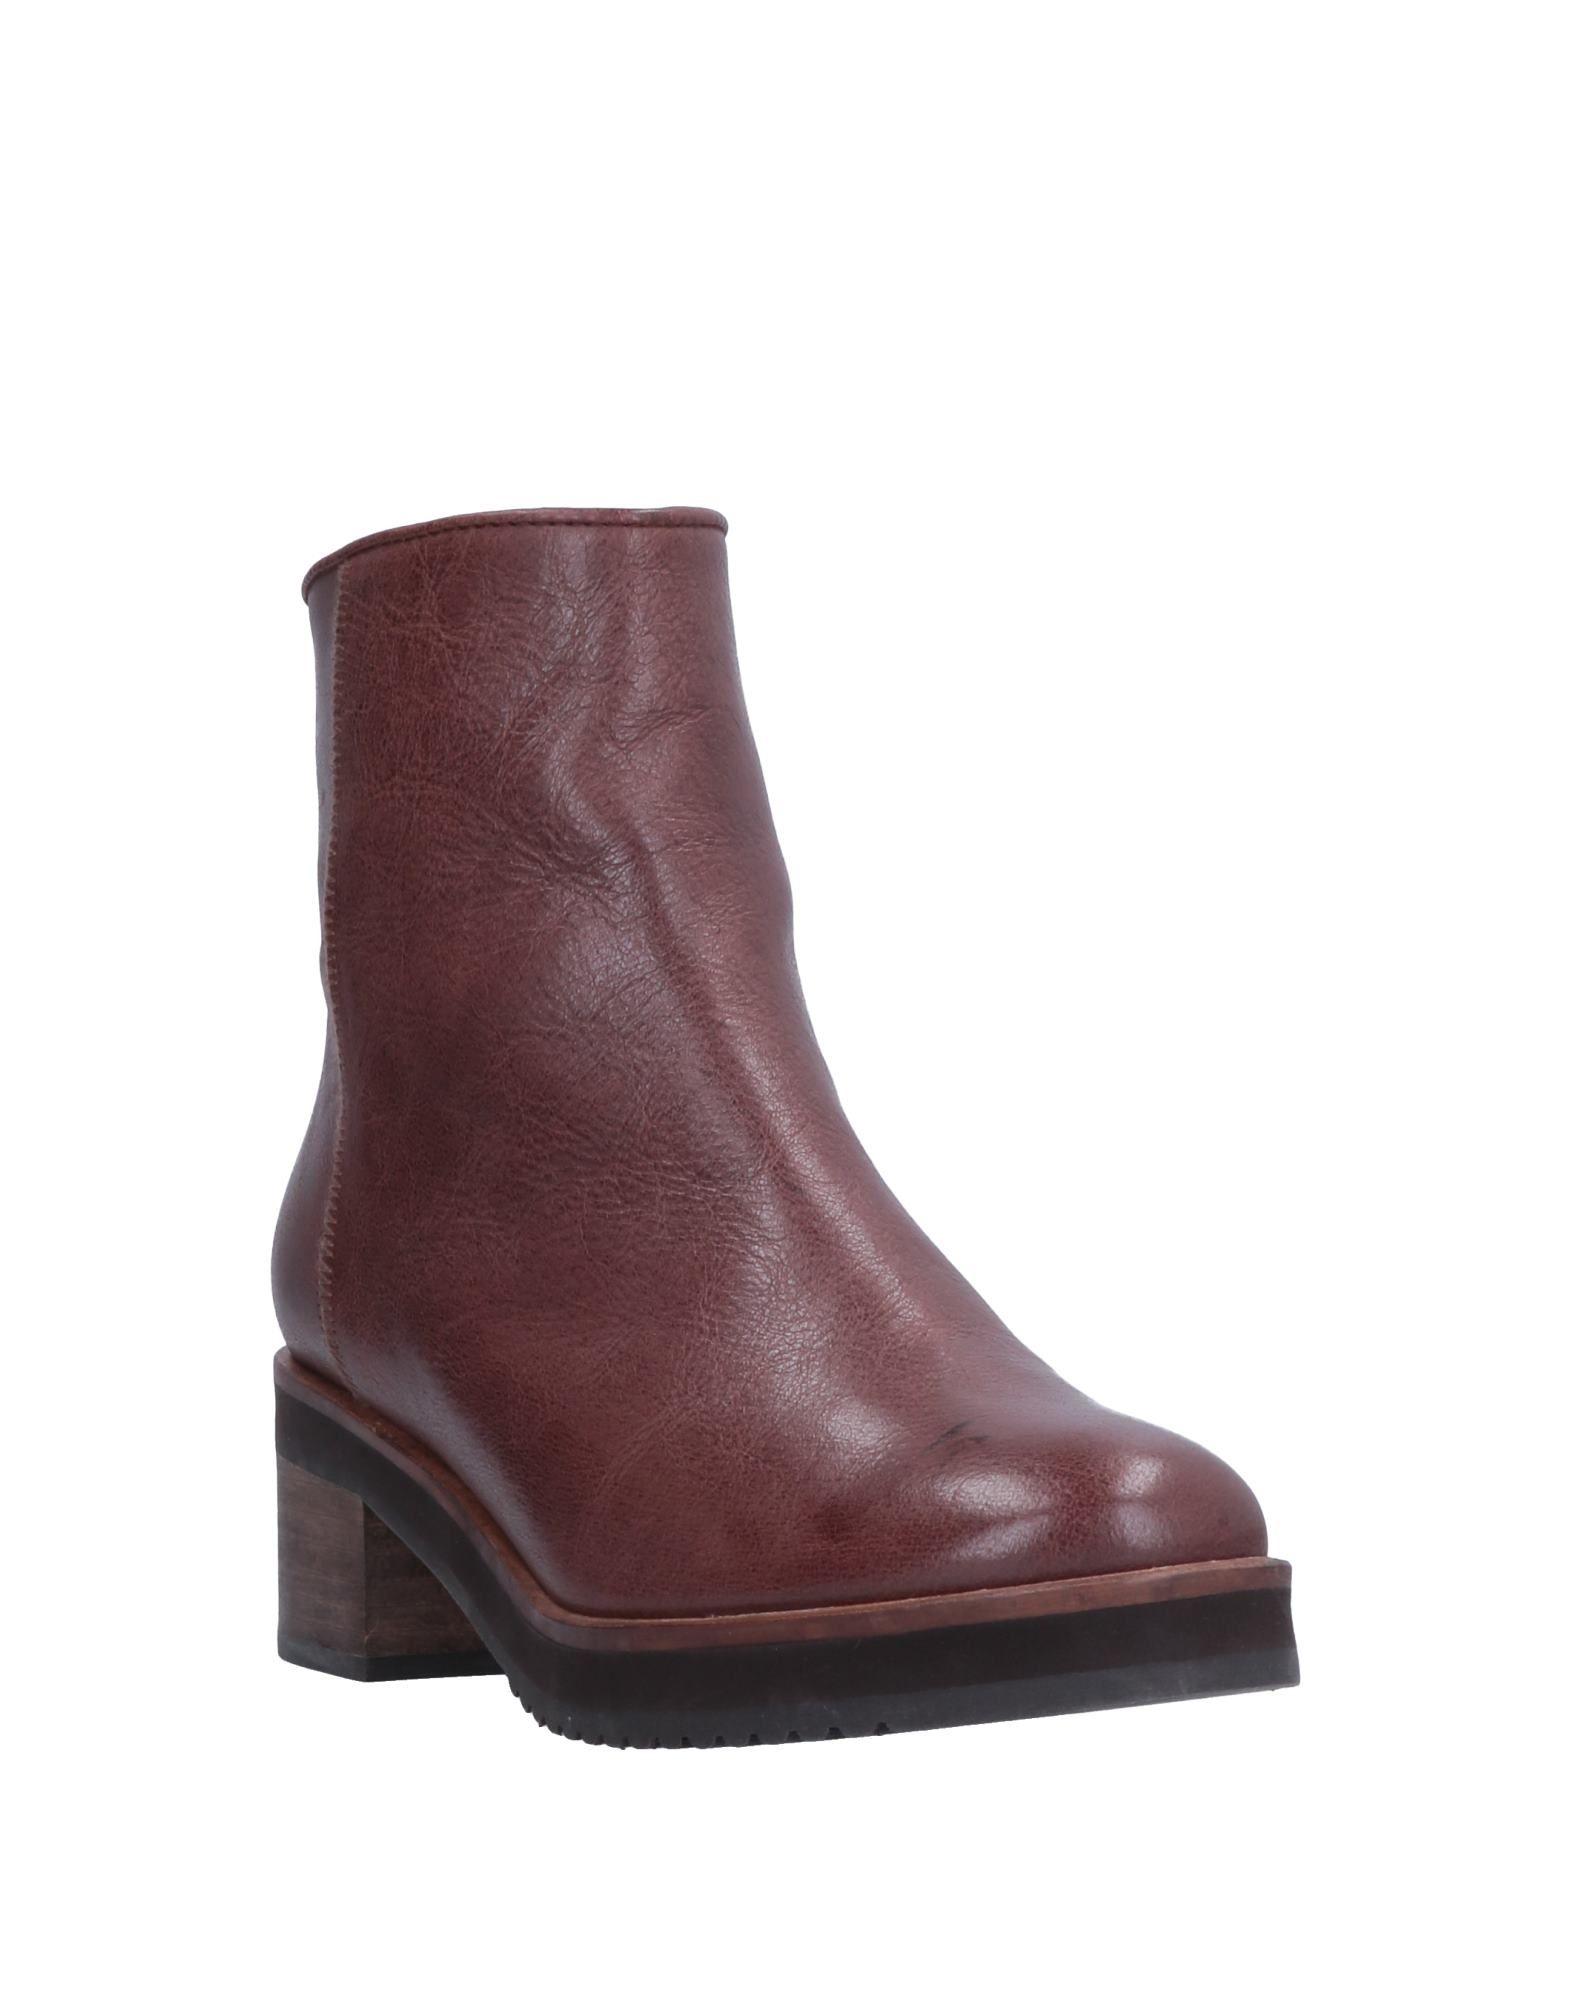 Stilvolle billige Schuhe Damen Anaid Kupuri Stiefelette Damen Schuhe  11550051RU f7d1ba